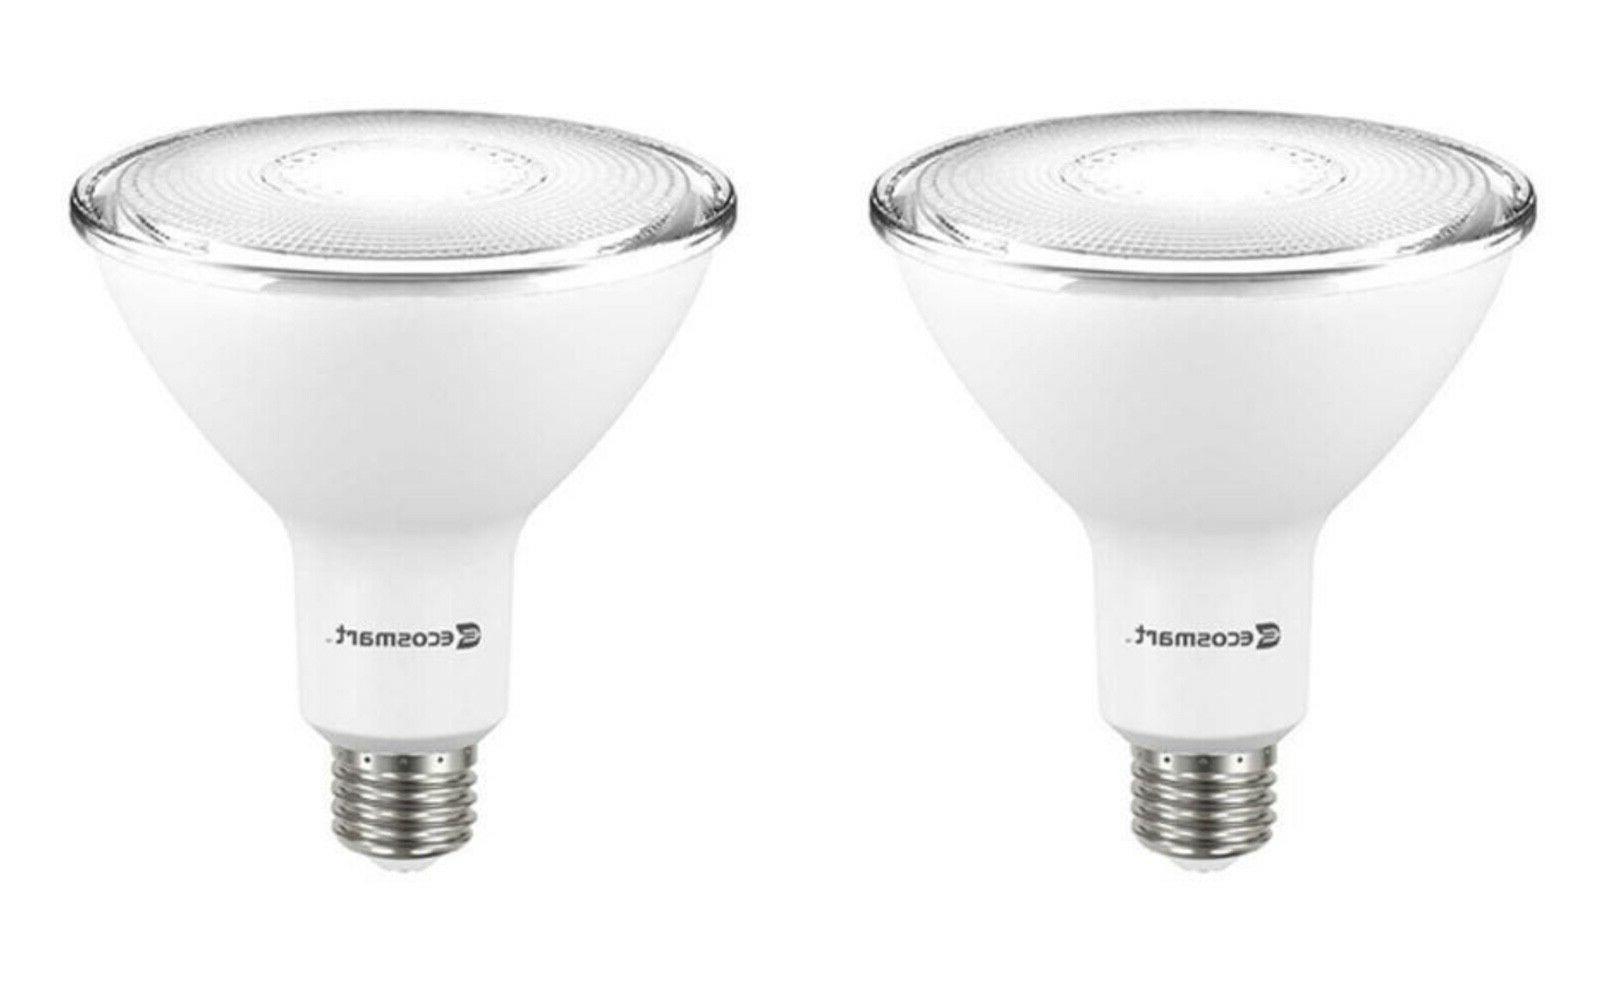 EcoSmart 90-Watt PAR38 Dimmable Flood LED Light Bulb Bright